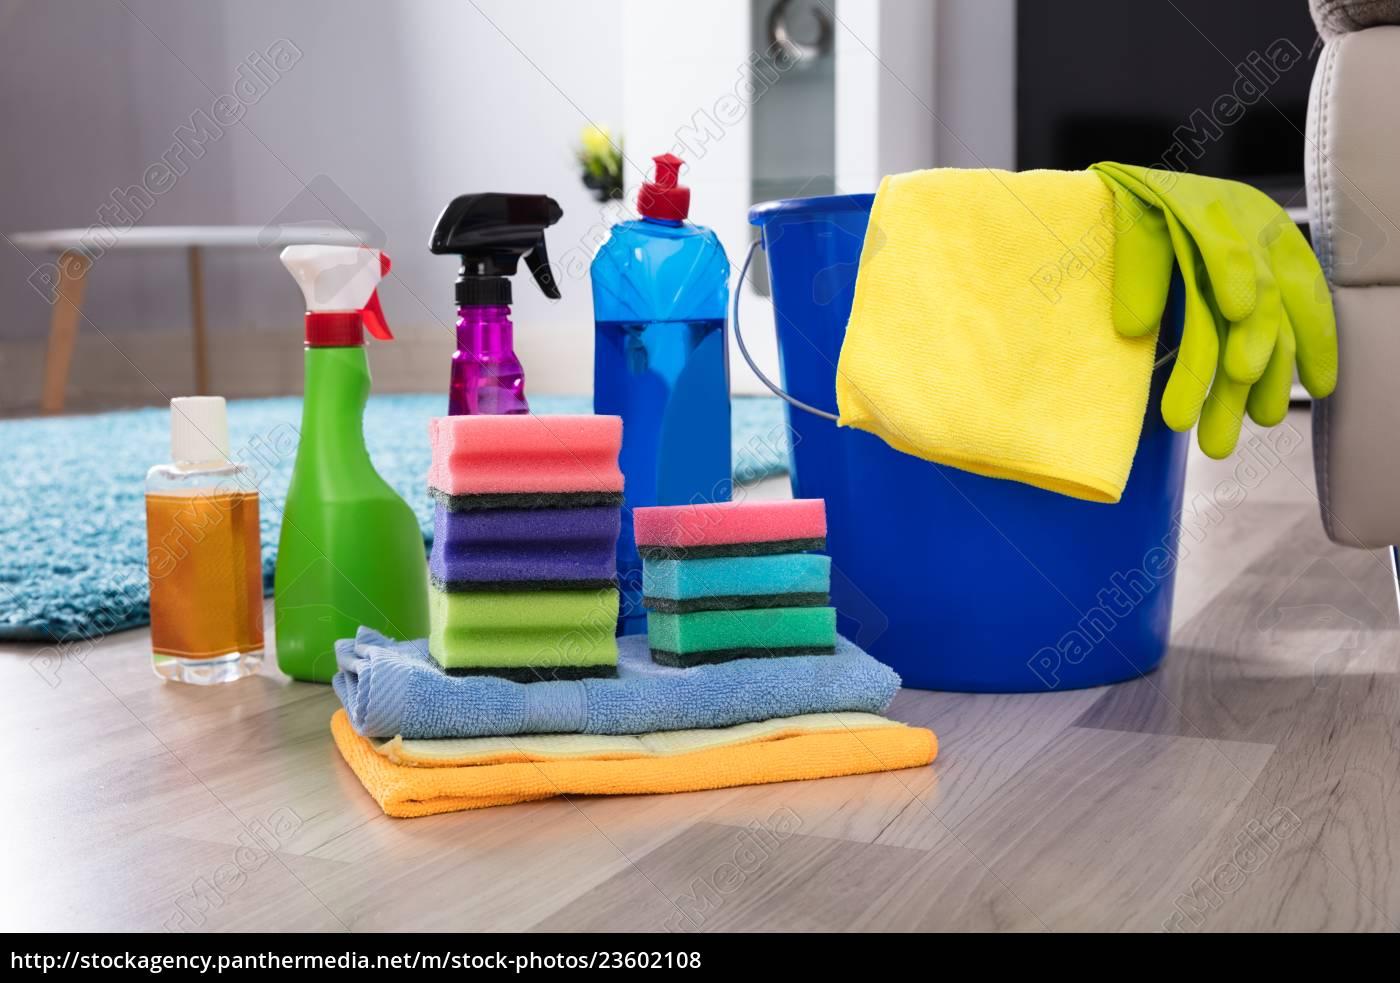 cleaning, equipments, on, hardwood, floor - 23602108